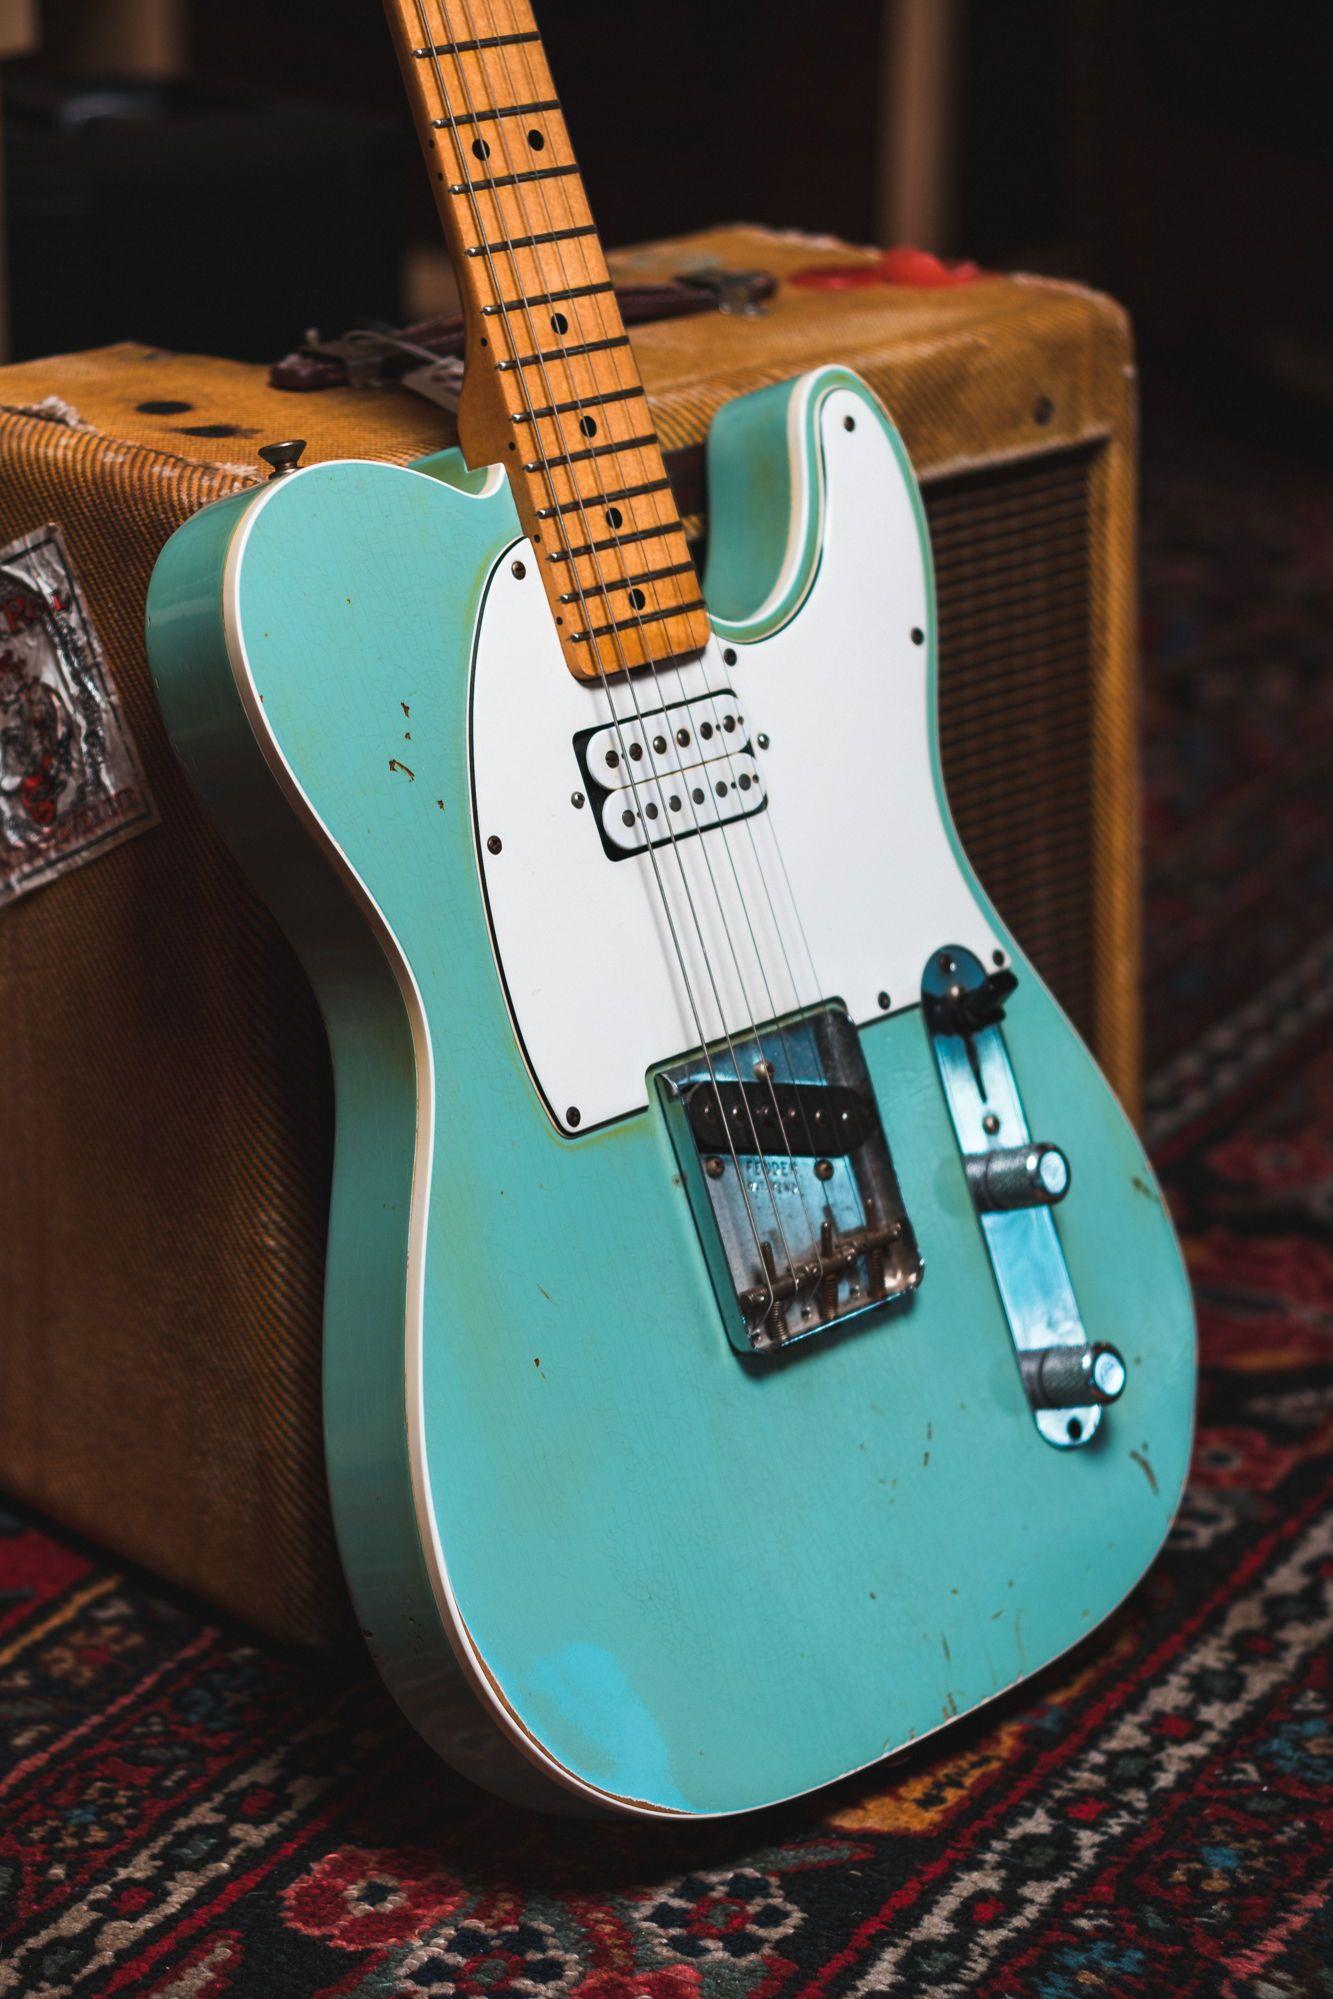 Fender Custom Shop 1963 Telecaster Relic Surf Daphne Blue 2008 S459 Guitar On Pinterest Steampunk And Epiphone